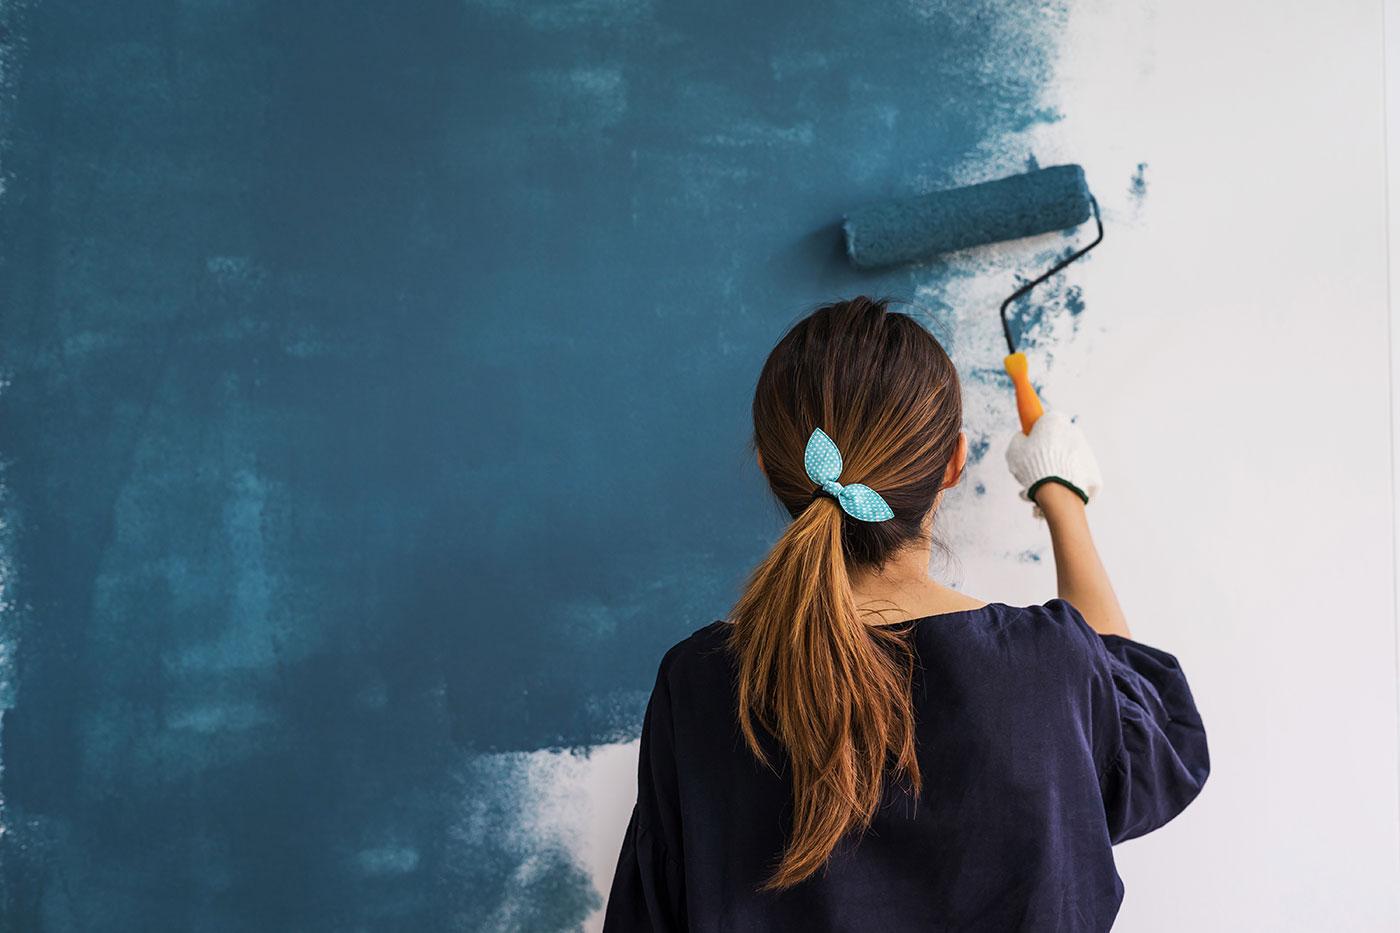 rinnovare casa - parete blu